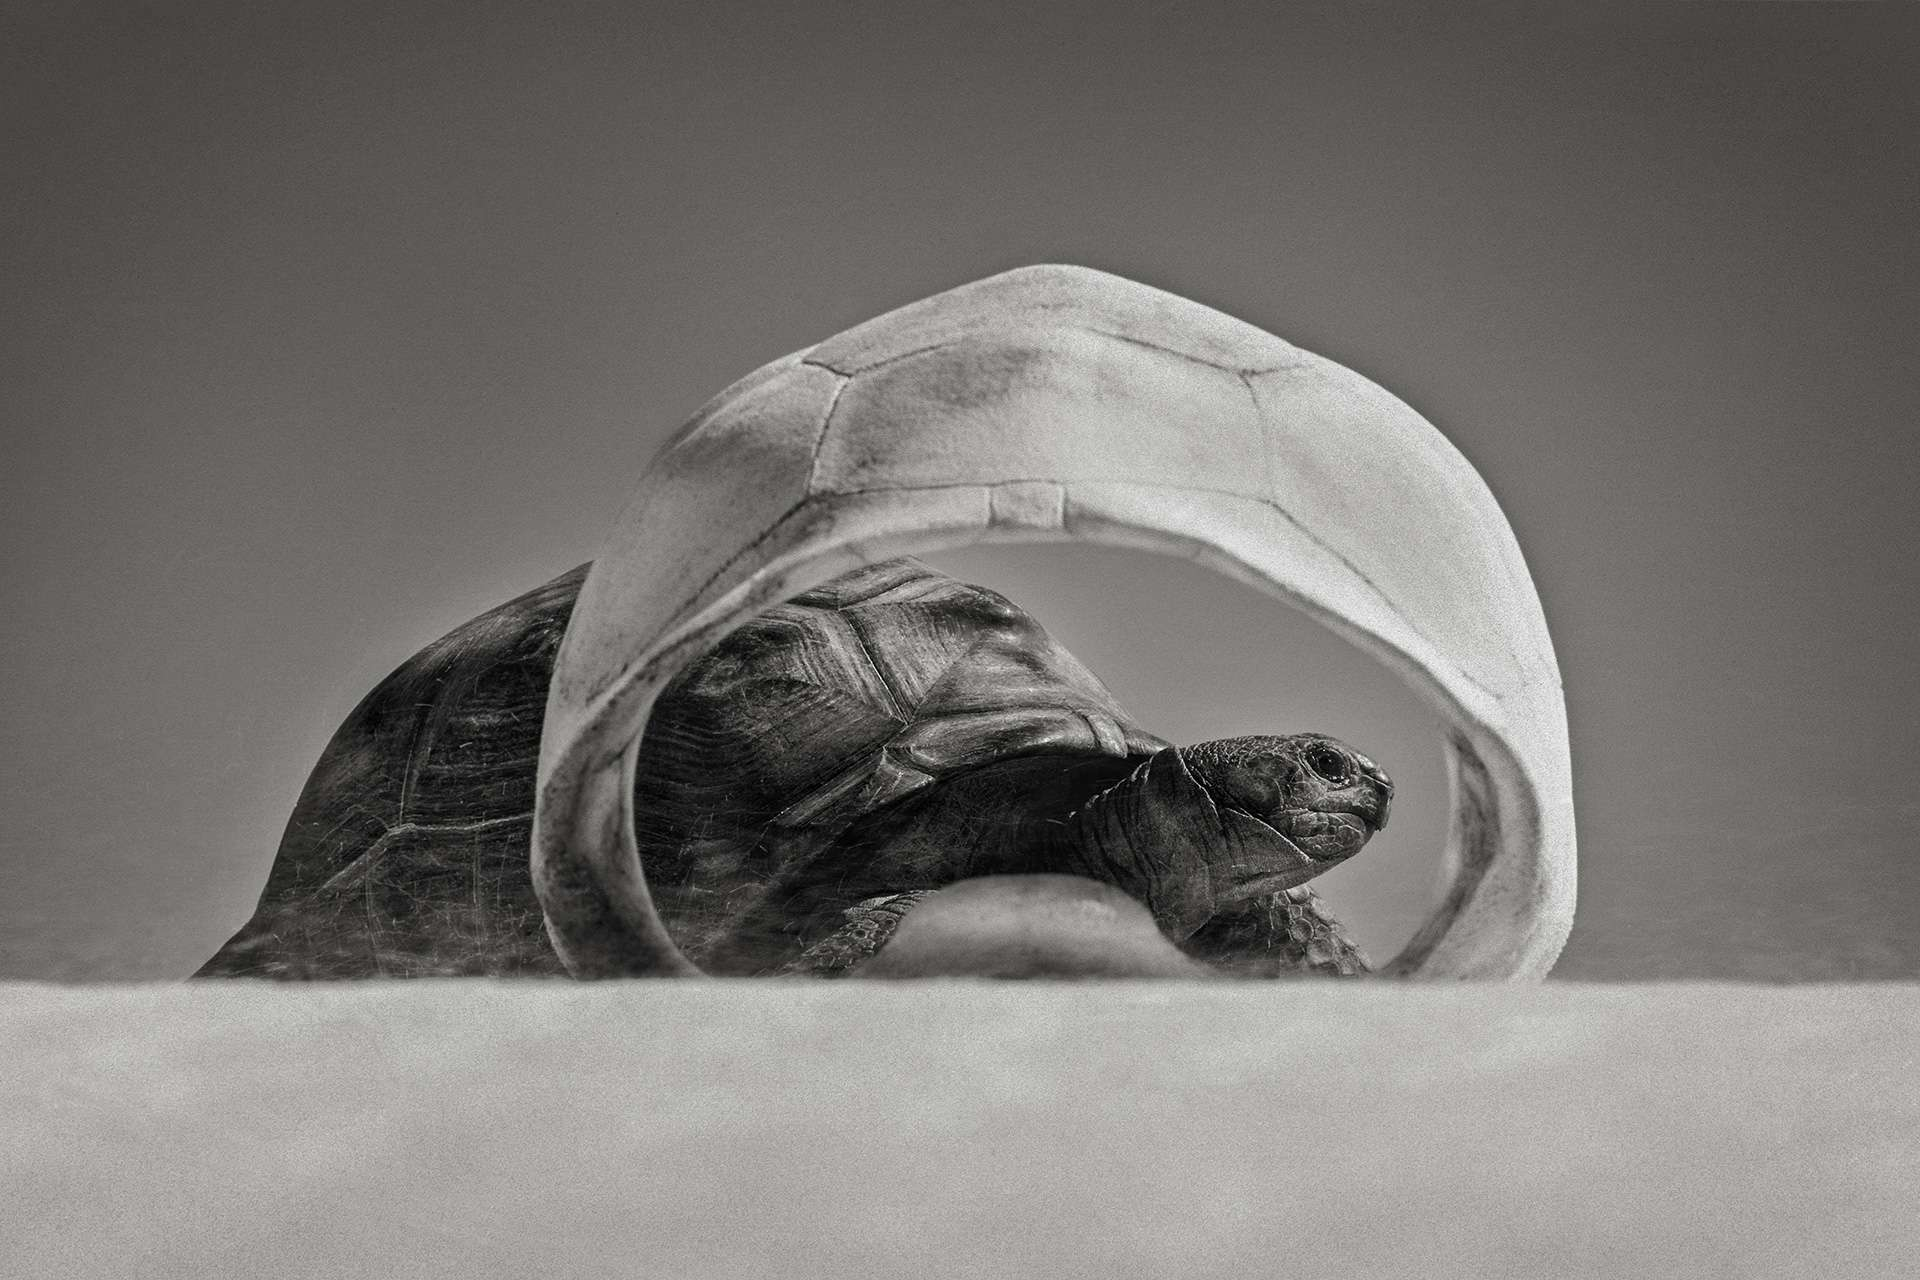 Gilles Martin's photograph : Aldabra giant tortoise, Struggle for life